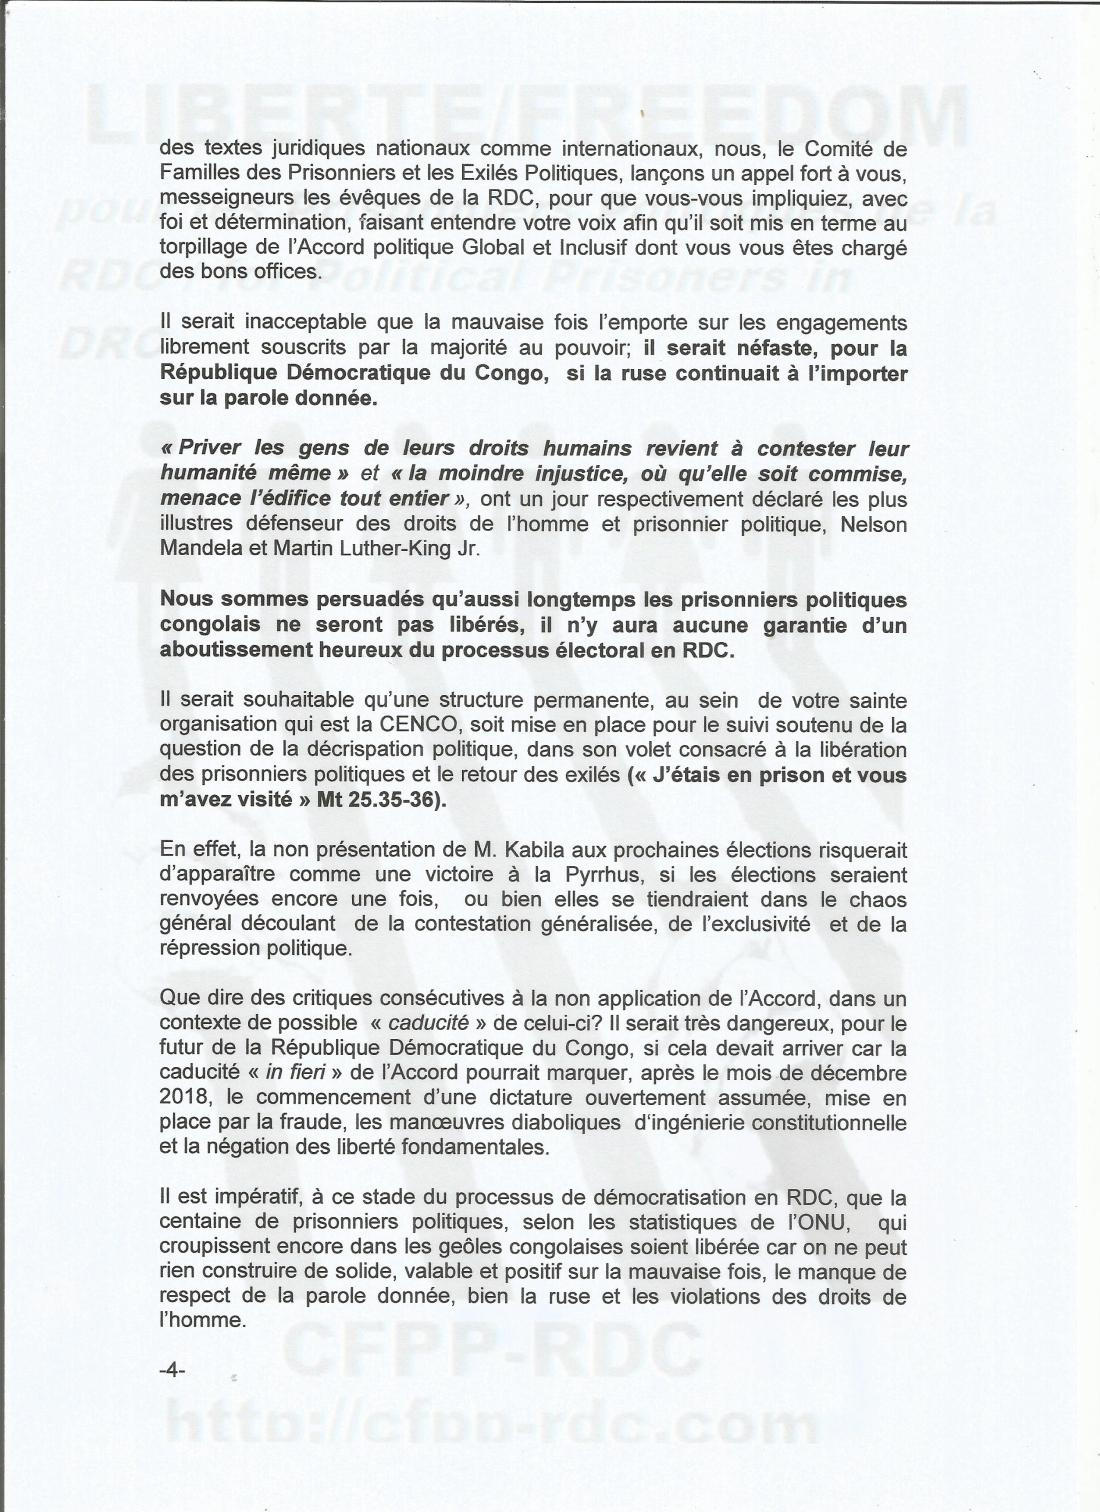 MEMORANDUM A LA CENCO 14.11.180004